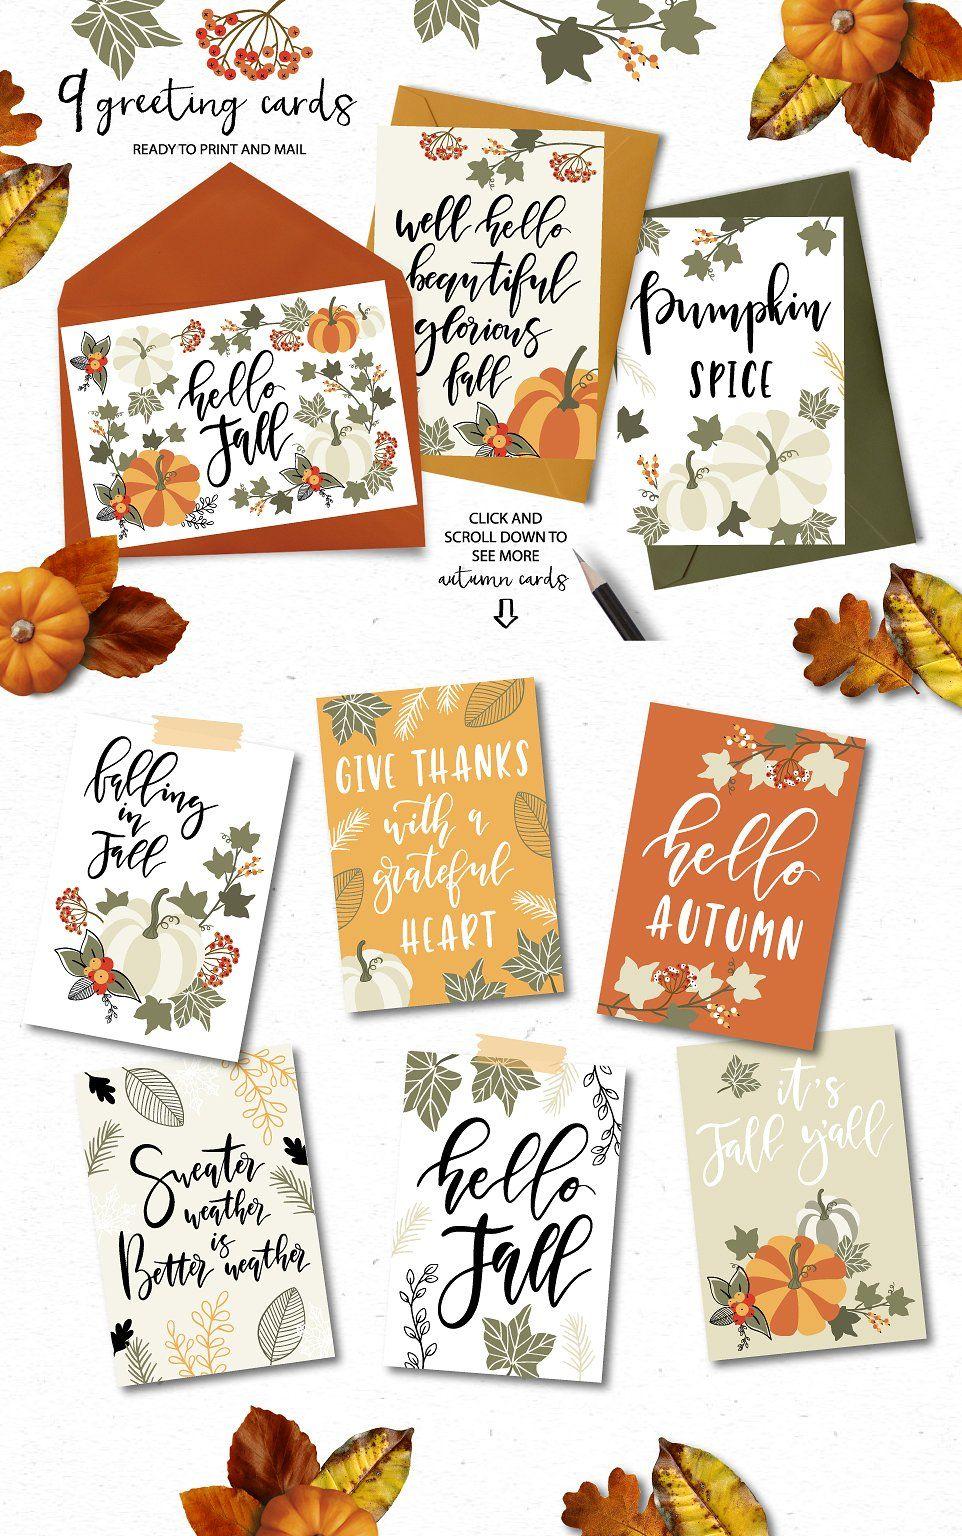 Autumn u fall clip art quotes by lokko studio on creativemarket